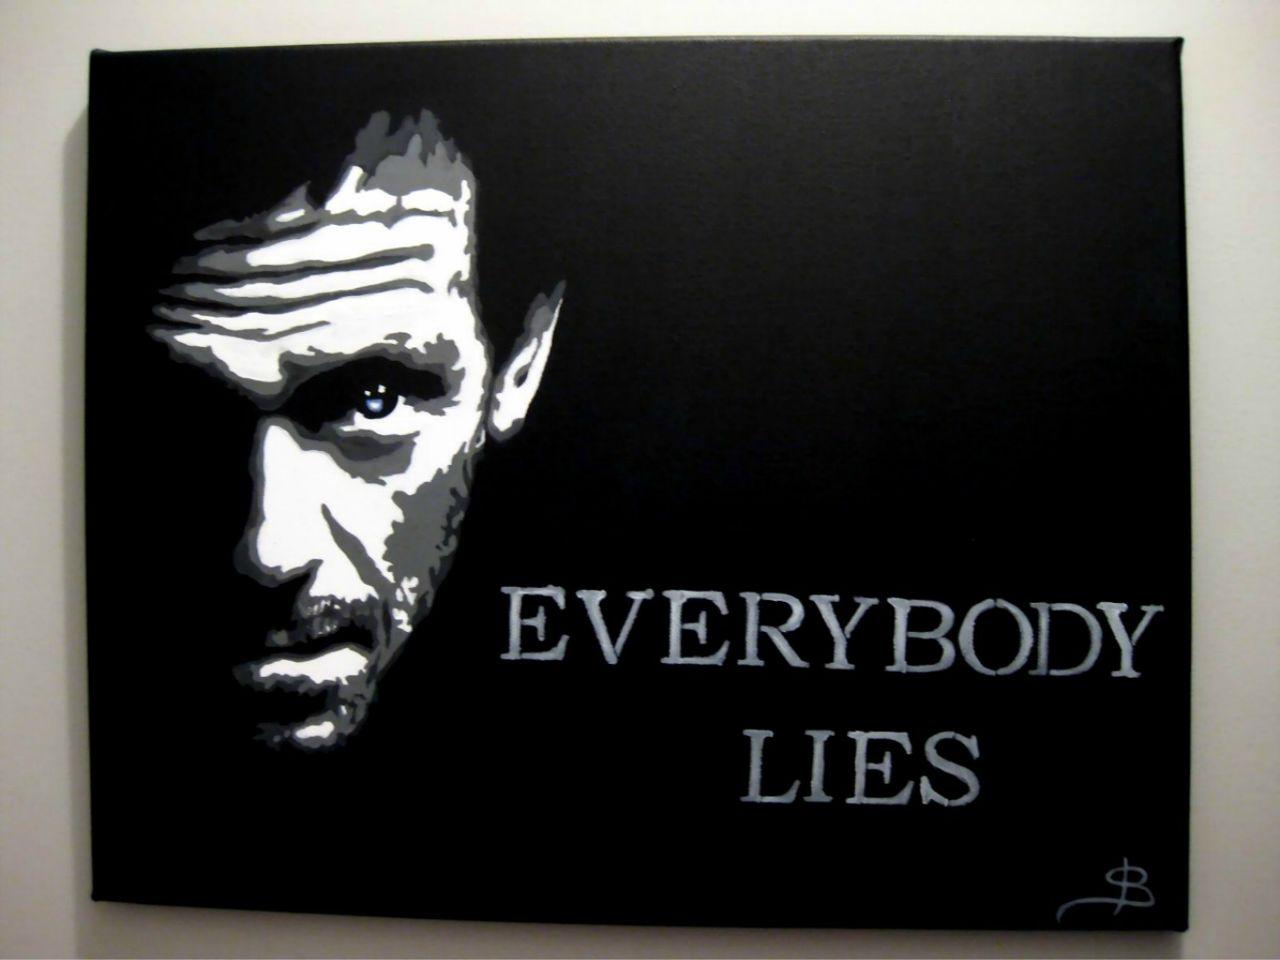 Stéphanie Bouchard Everybody lies